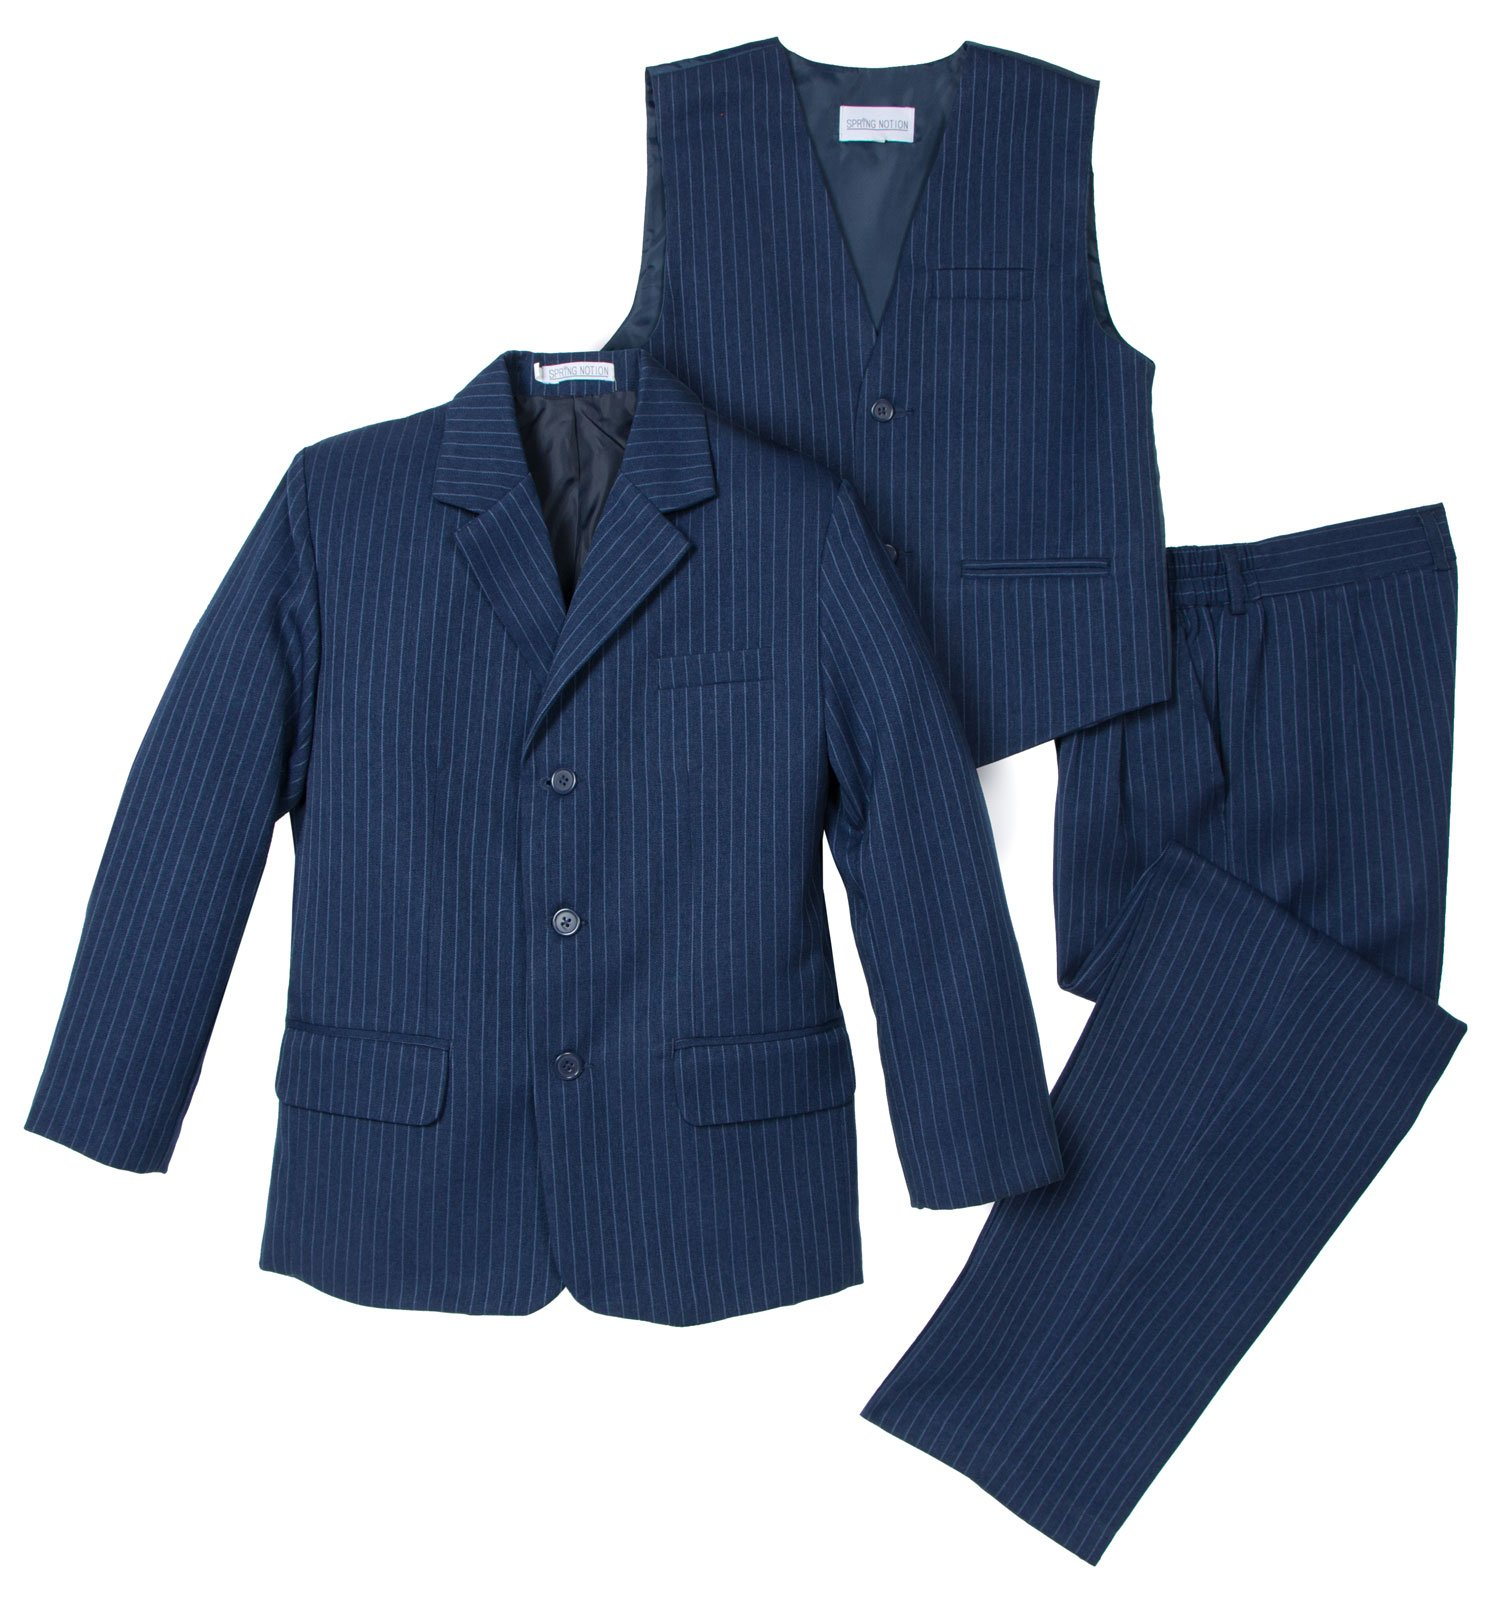 Spring Notion Big Boys' 3 Piece Pinstripe Suit Set 7 Blue